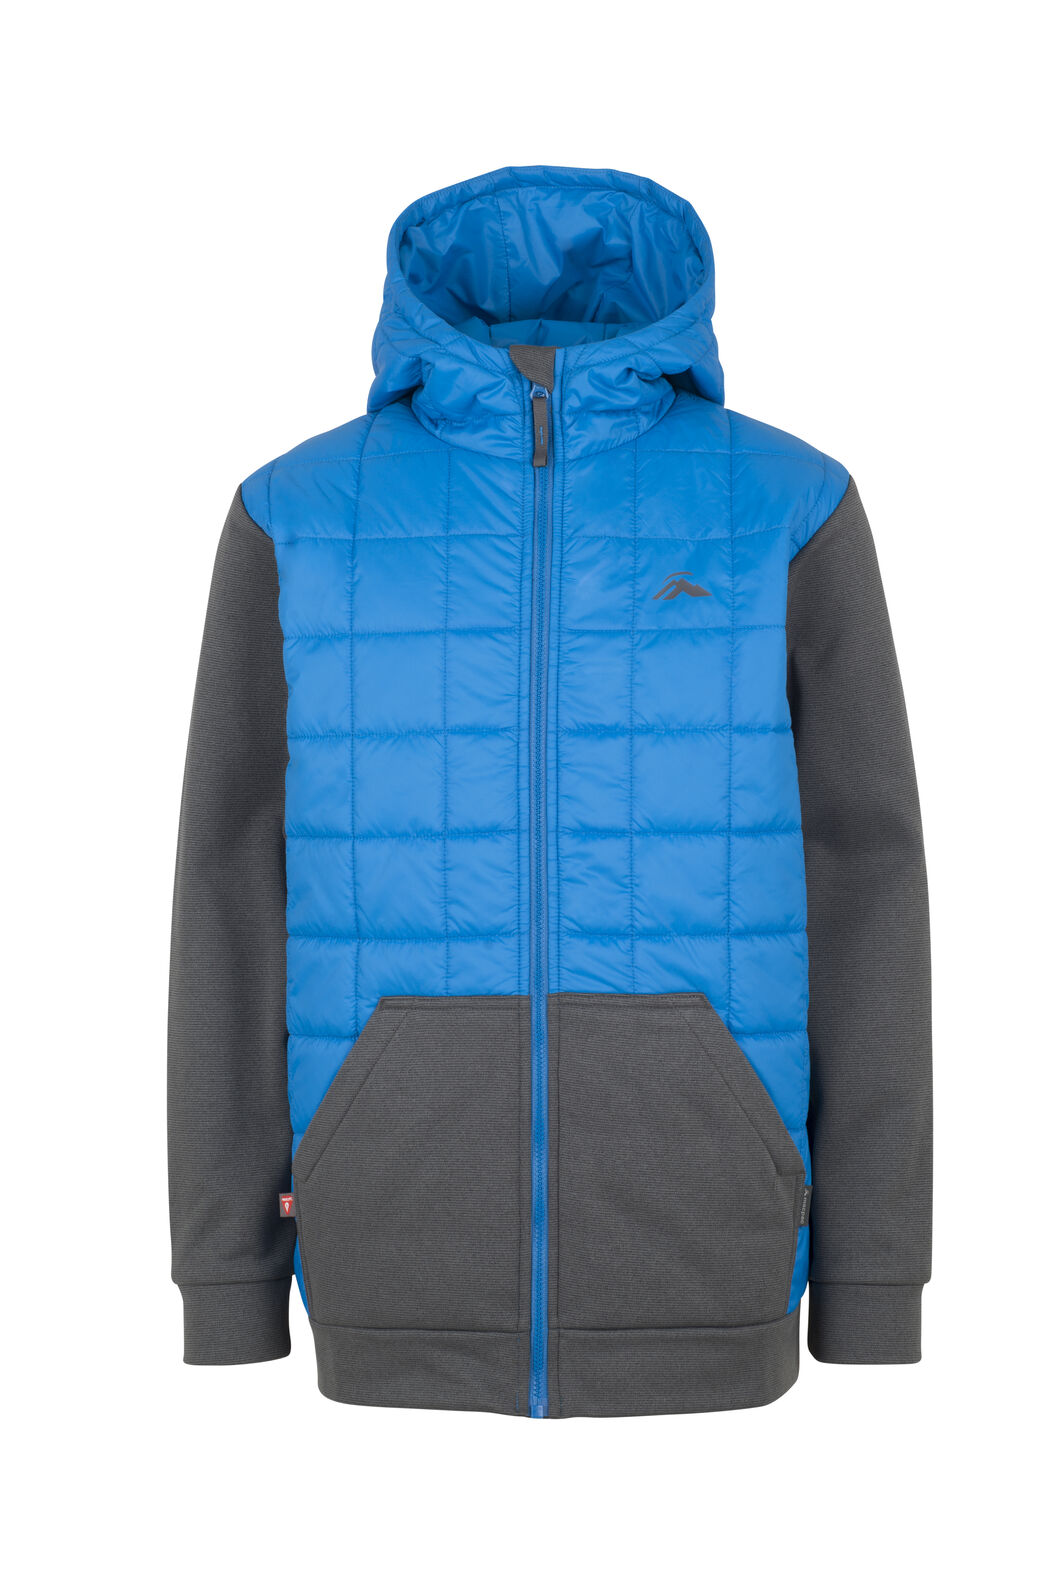 Macpac Campfire PrimaLoft® Hybrid Jacket - Kids', Directoire/Asphalt, hi-res